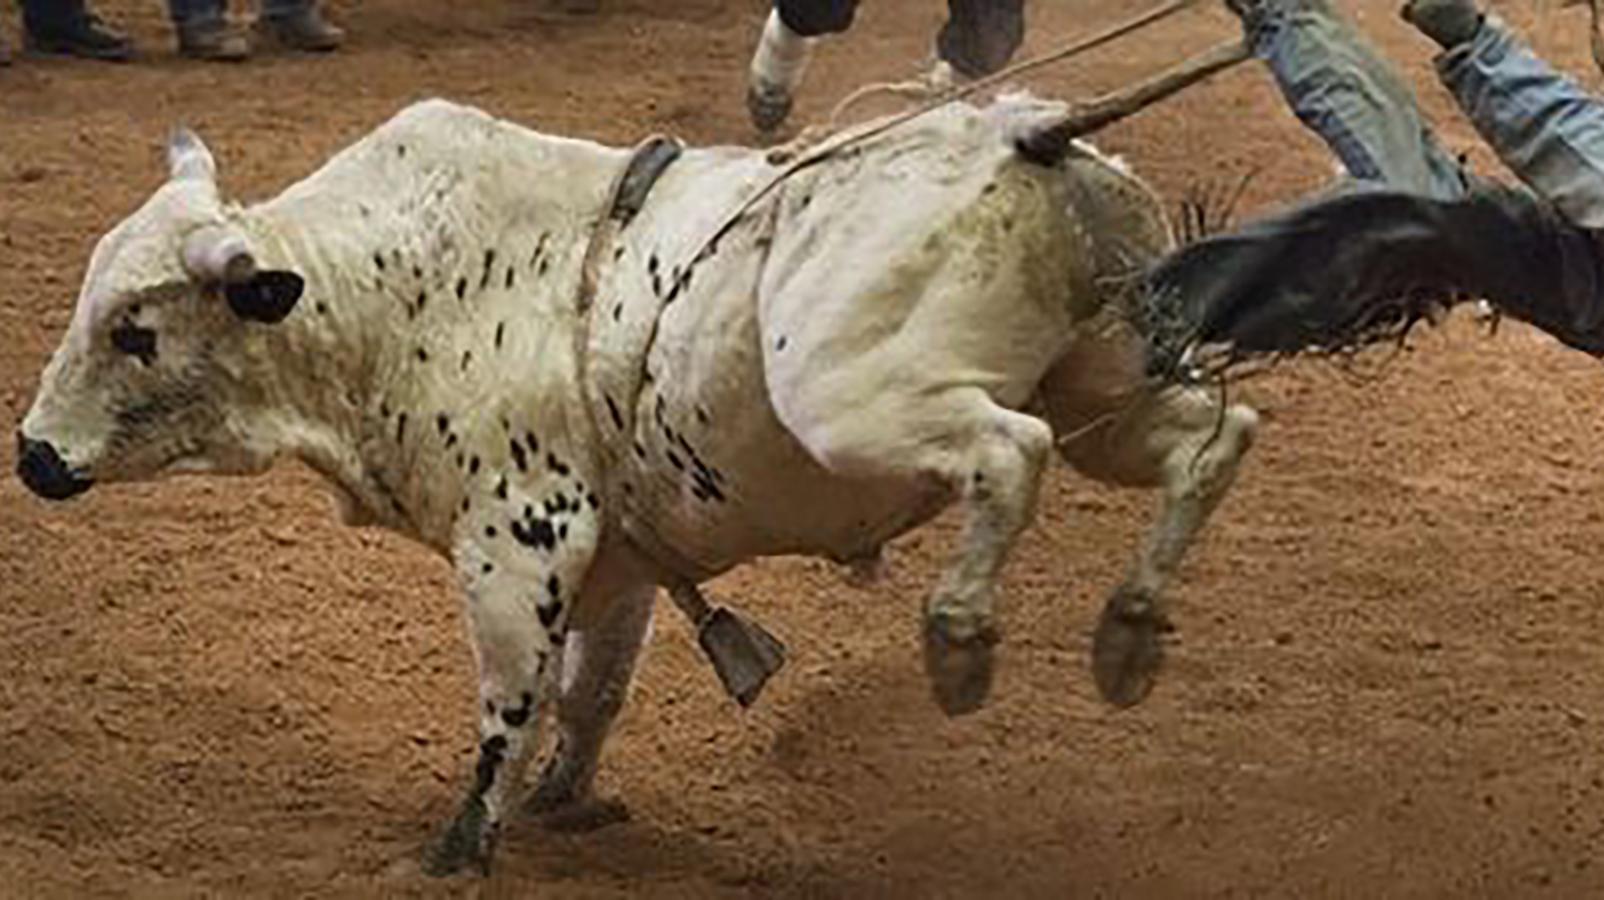 Professional Championship Bull Riding